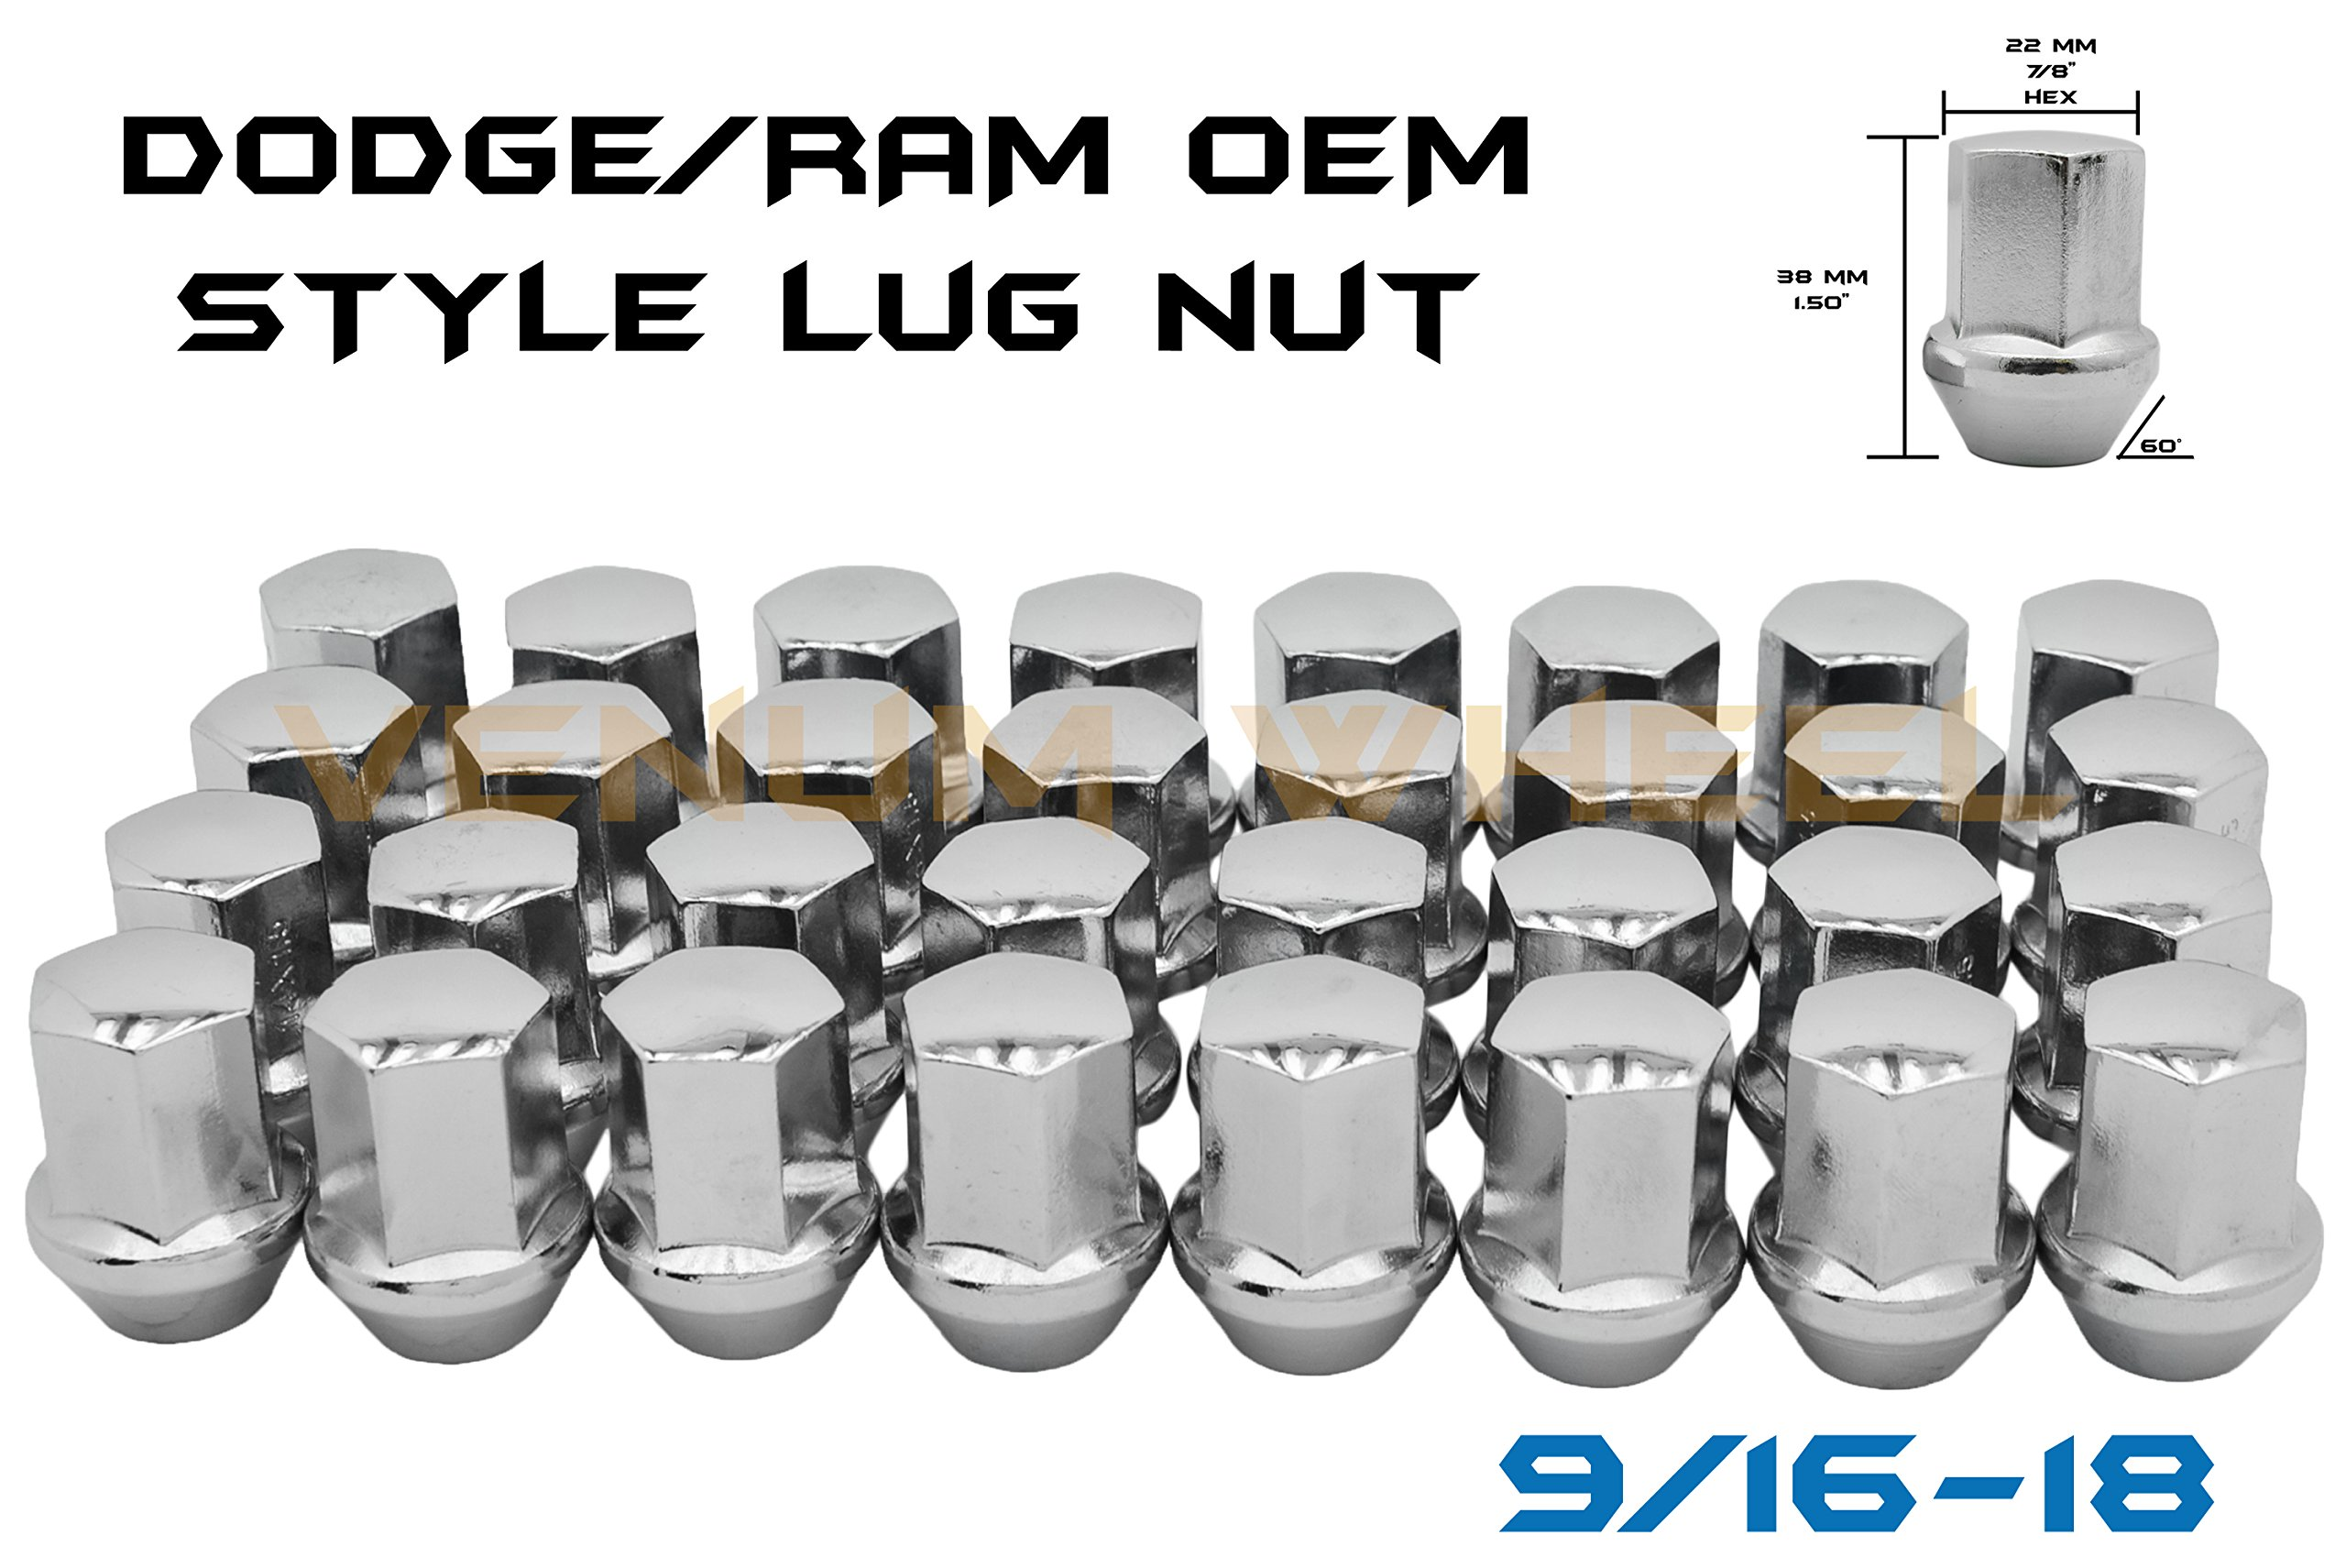 Venum wheel accessories 20 Pc 9/16'' OEM Style Factory Lug Nuts   Works 2002-2011 Dodge Ram 1500 Dakota & Durango